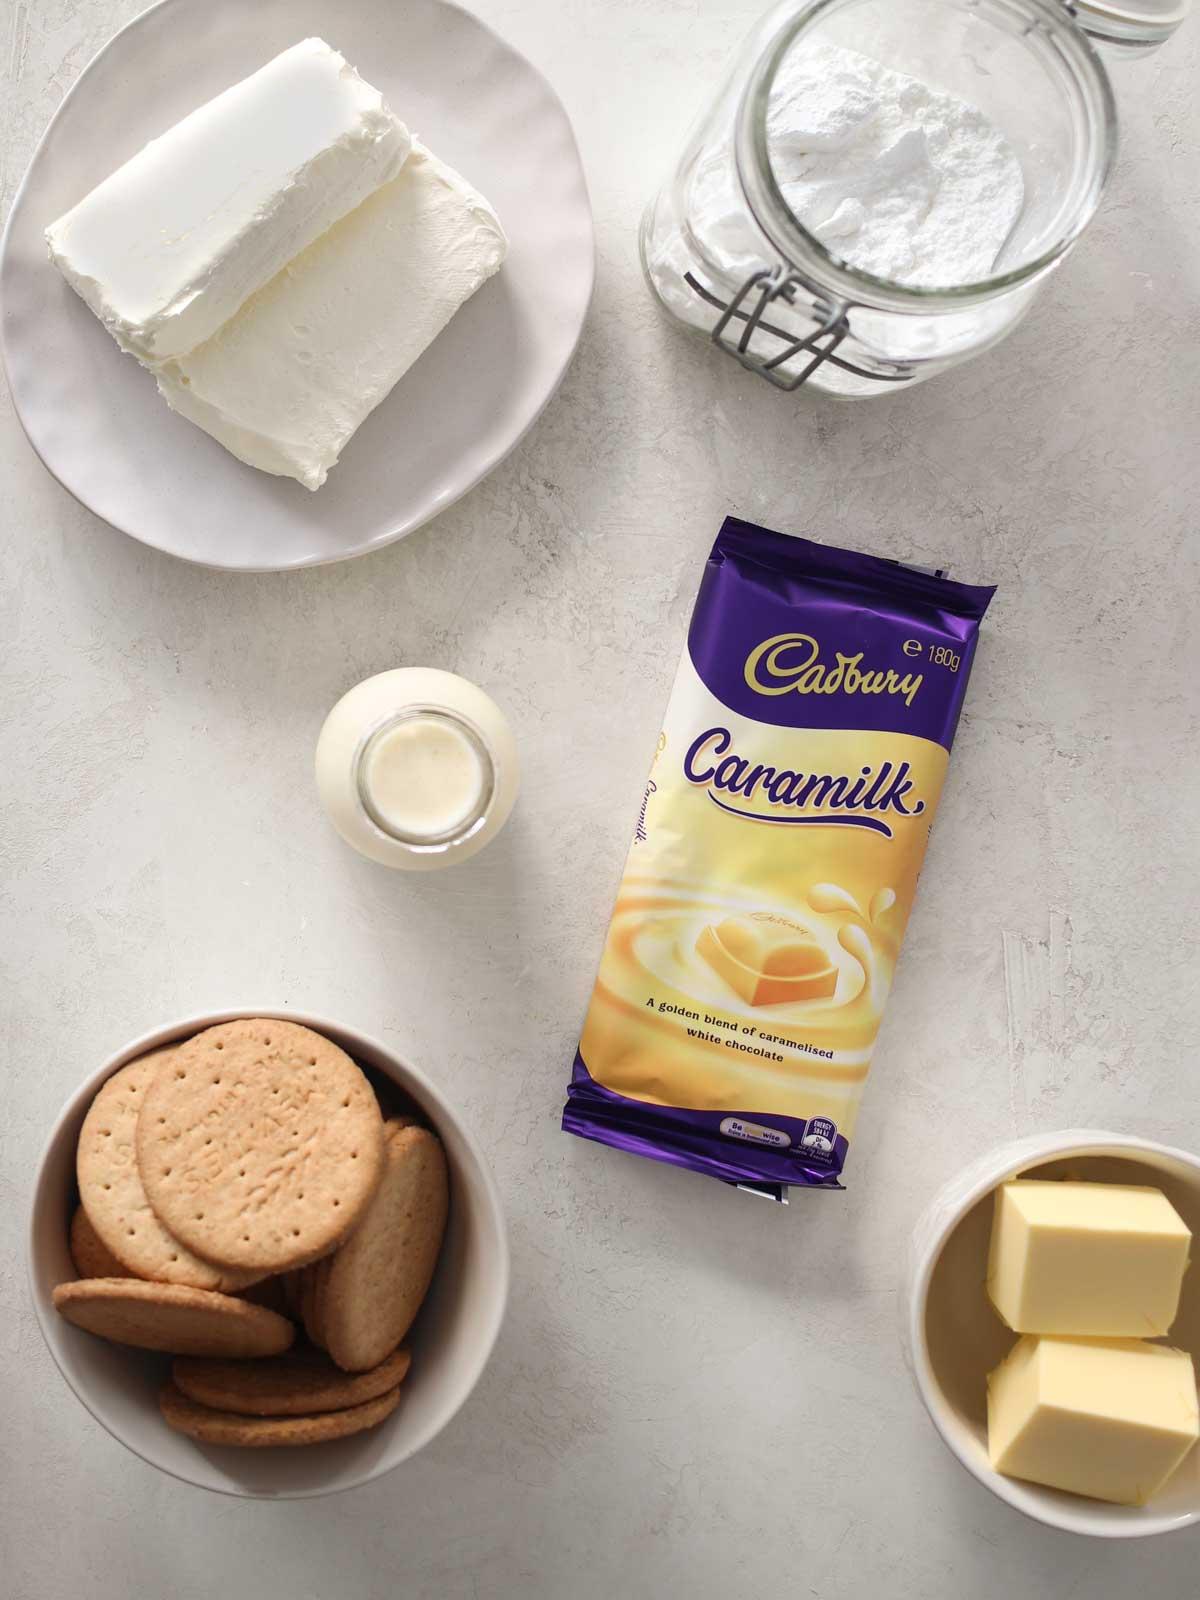 Caramilk Cheesecake Ingredients